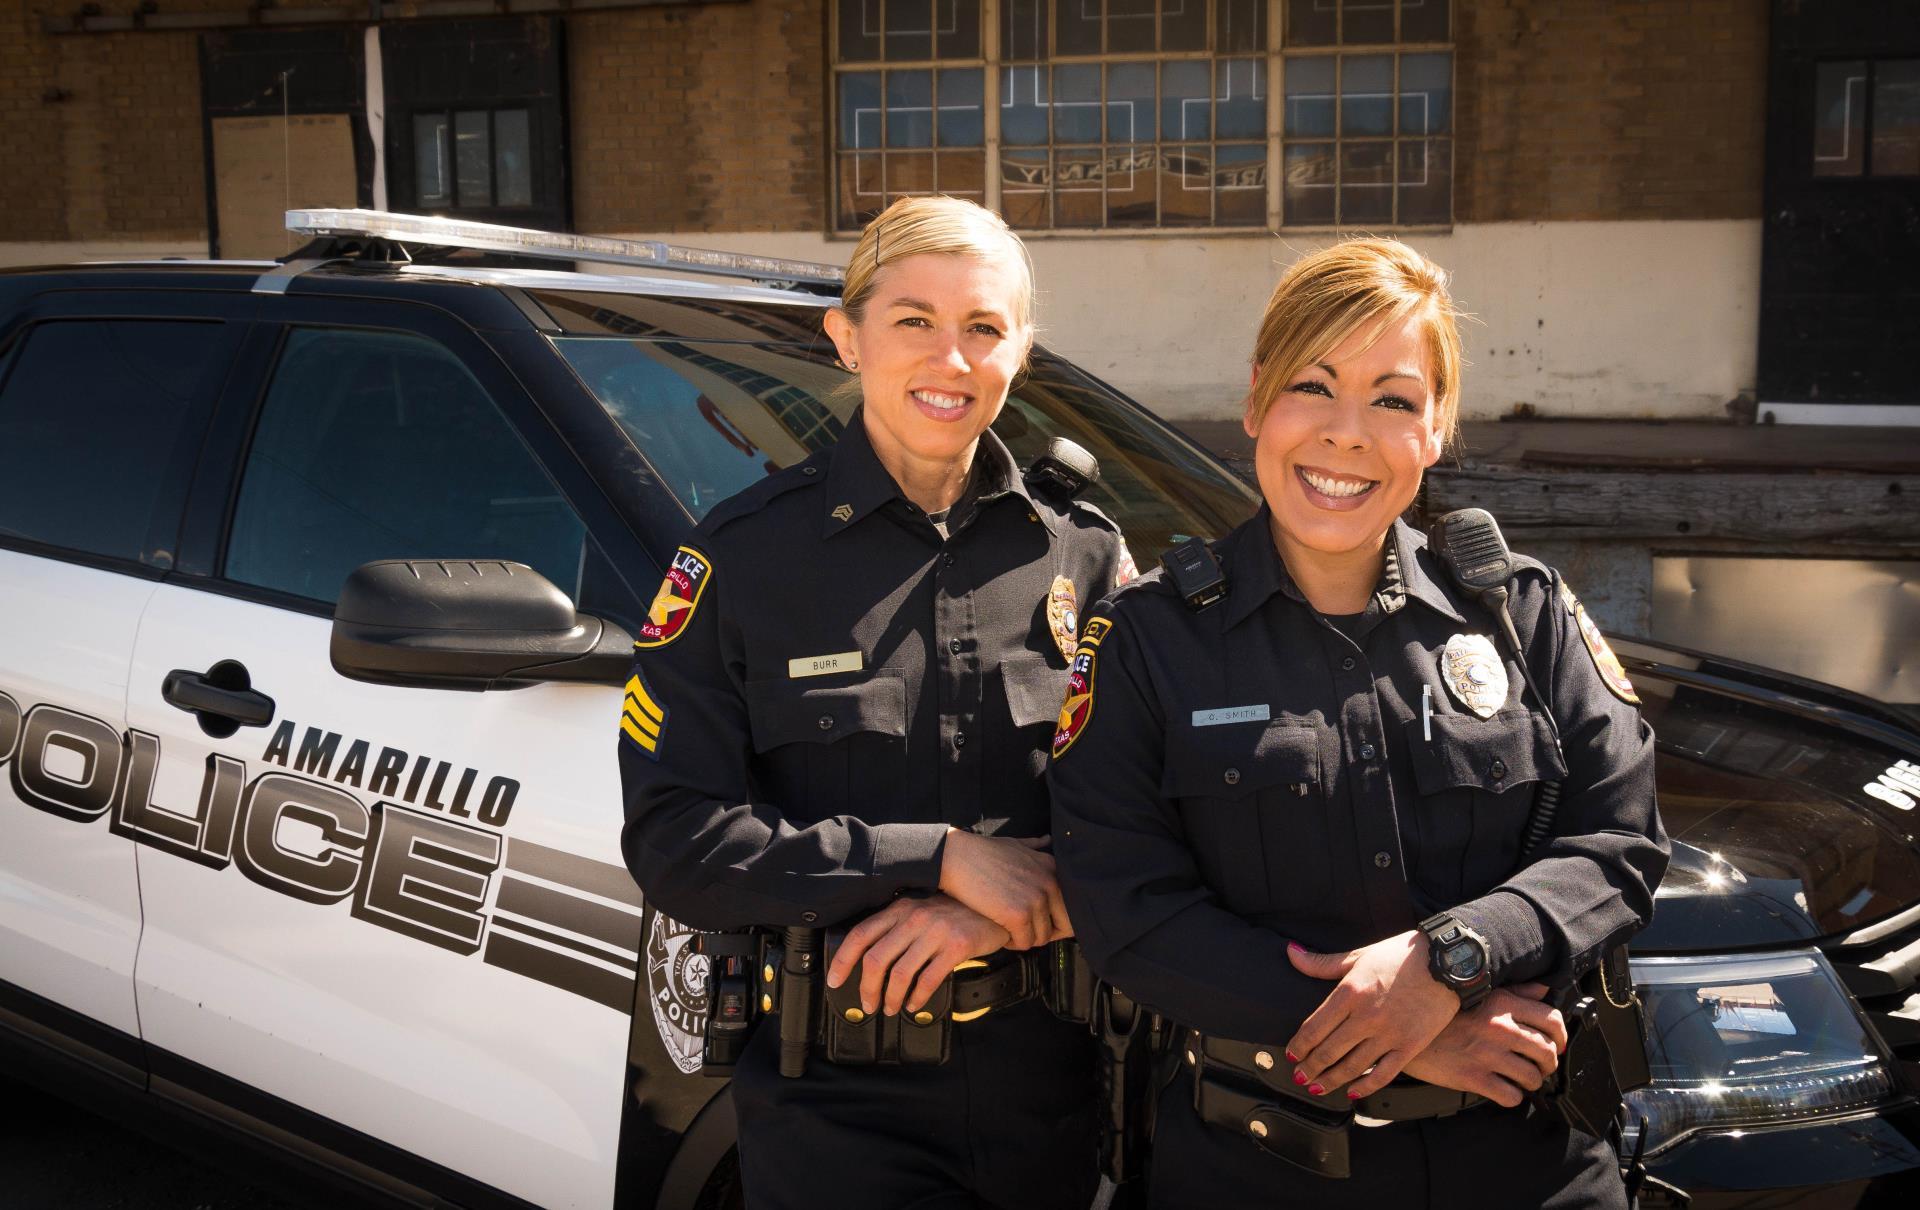 Benefits, Salary, & Requirements | City of Amarillo, TX